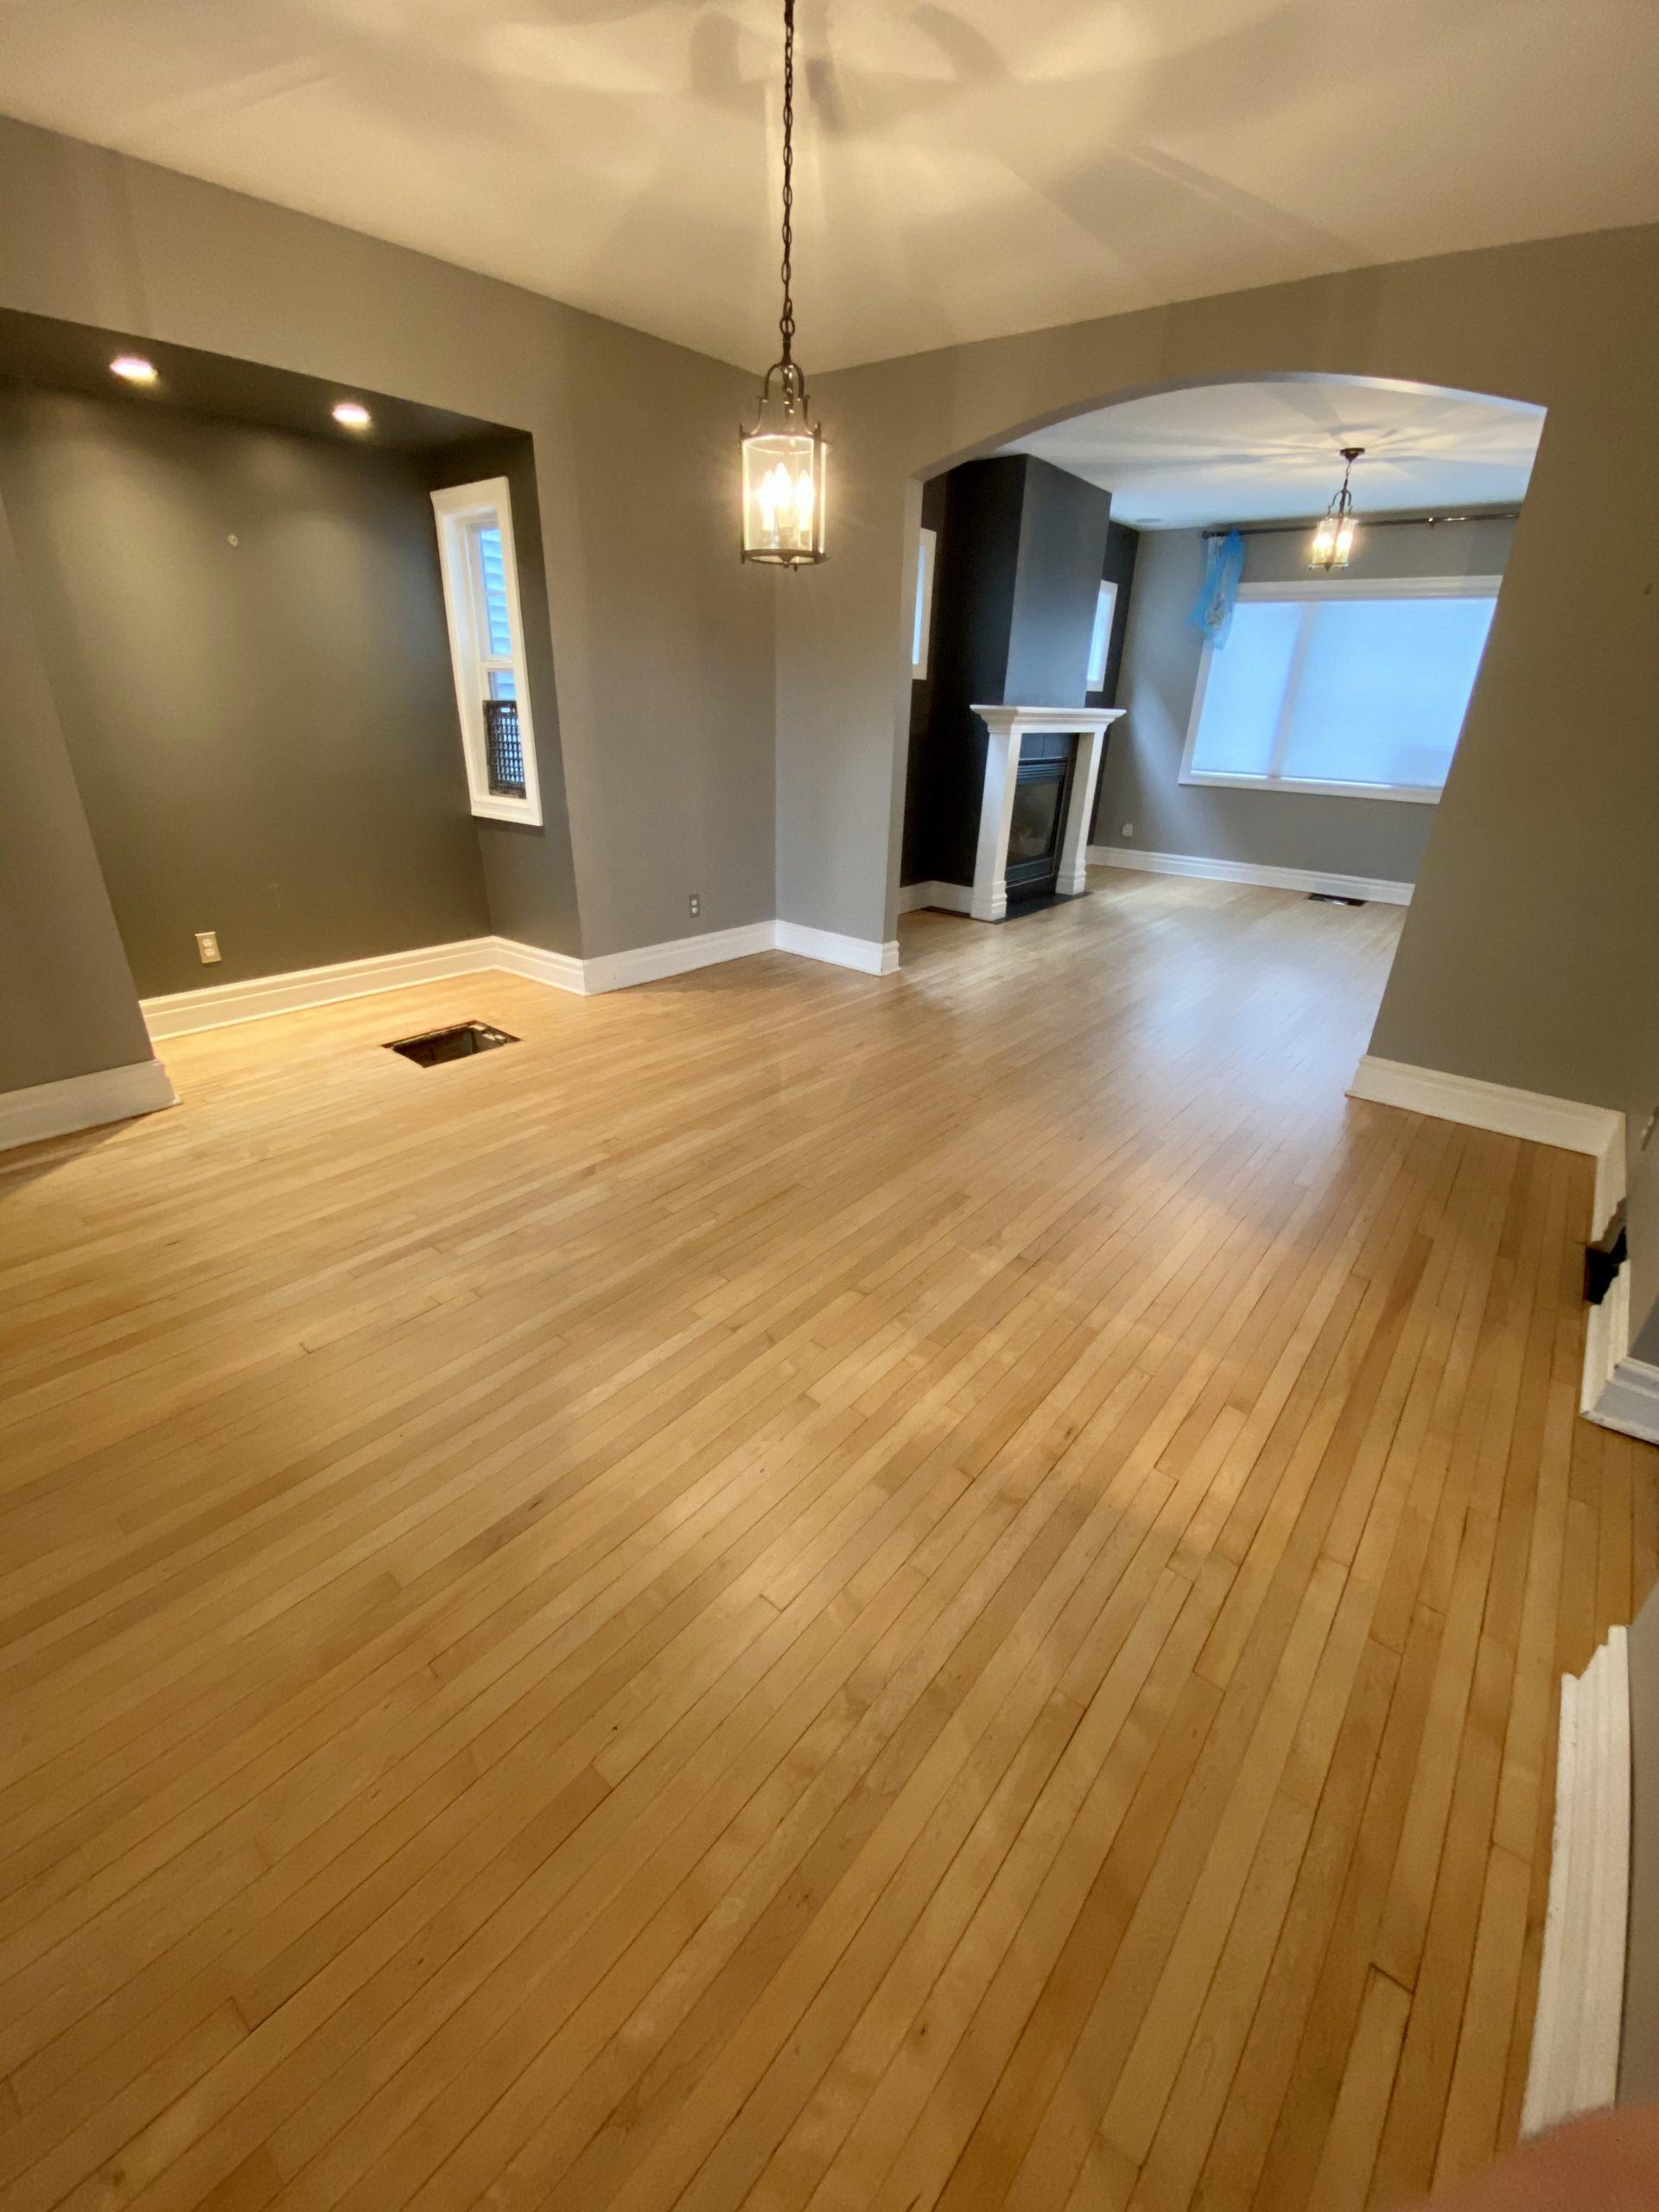 refinishing hardwood floors-3